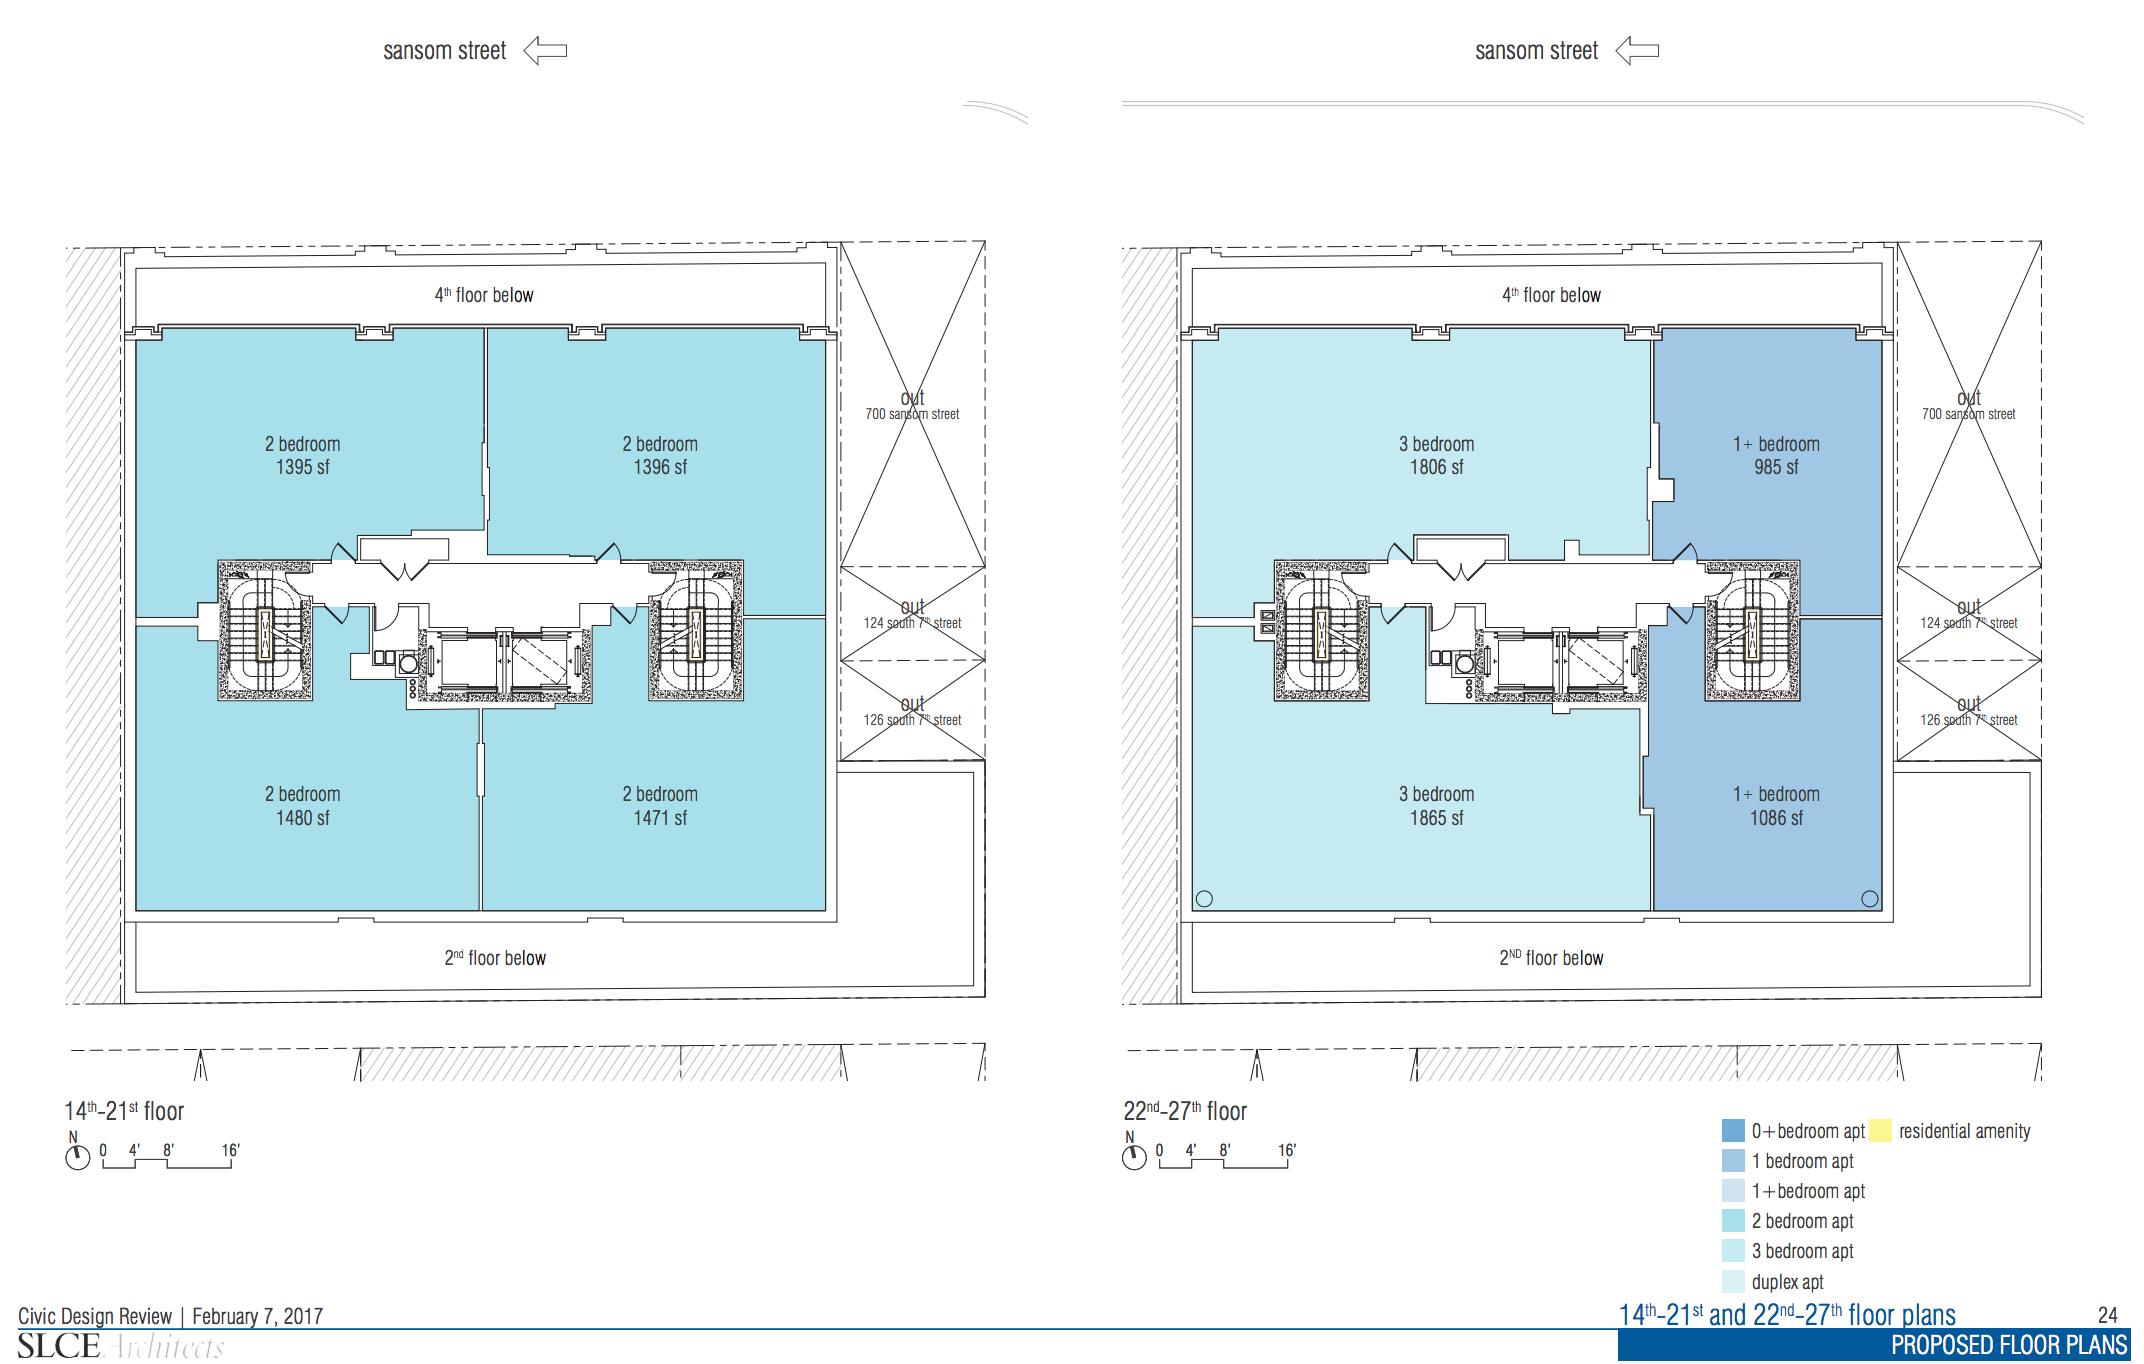 proposed jewelers row floor plans released ahead of design review proposed jewelers row floor plans released ahead of design review